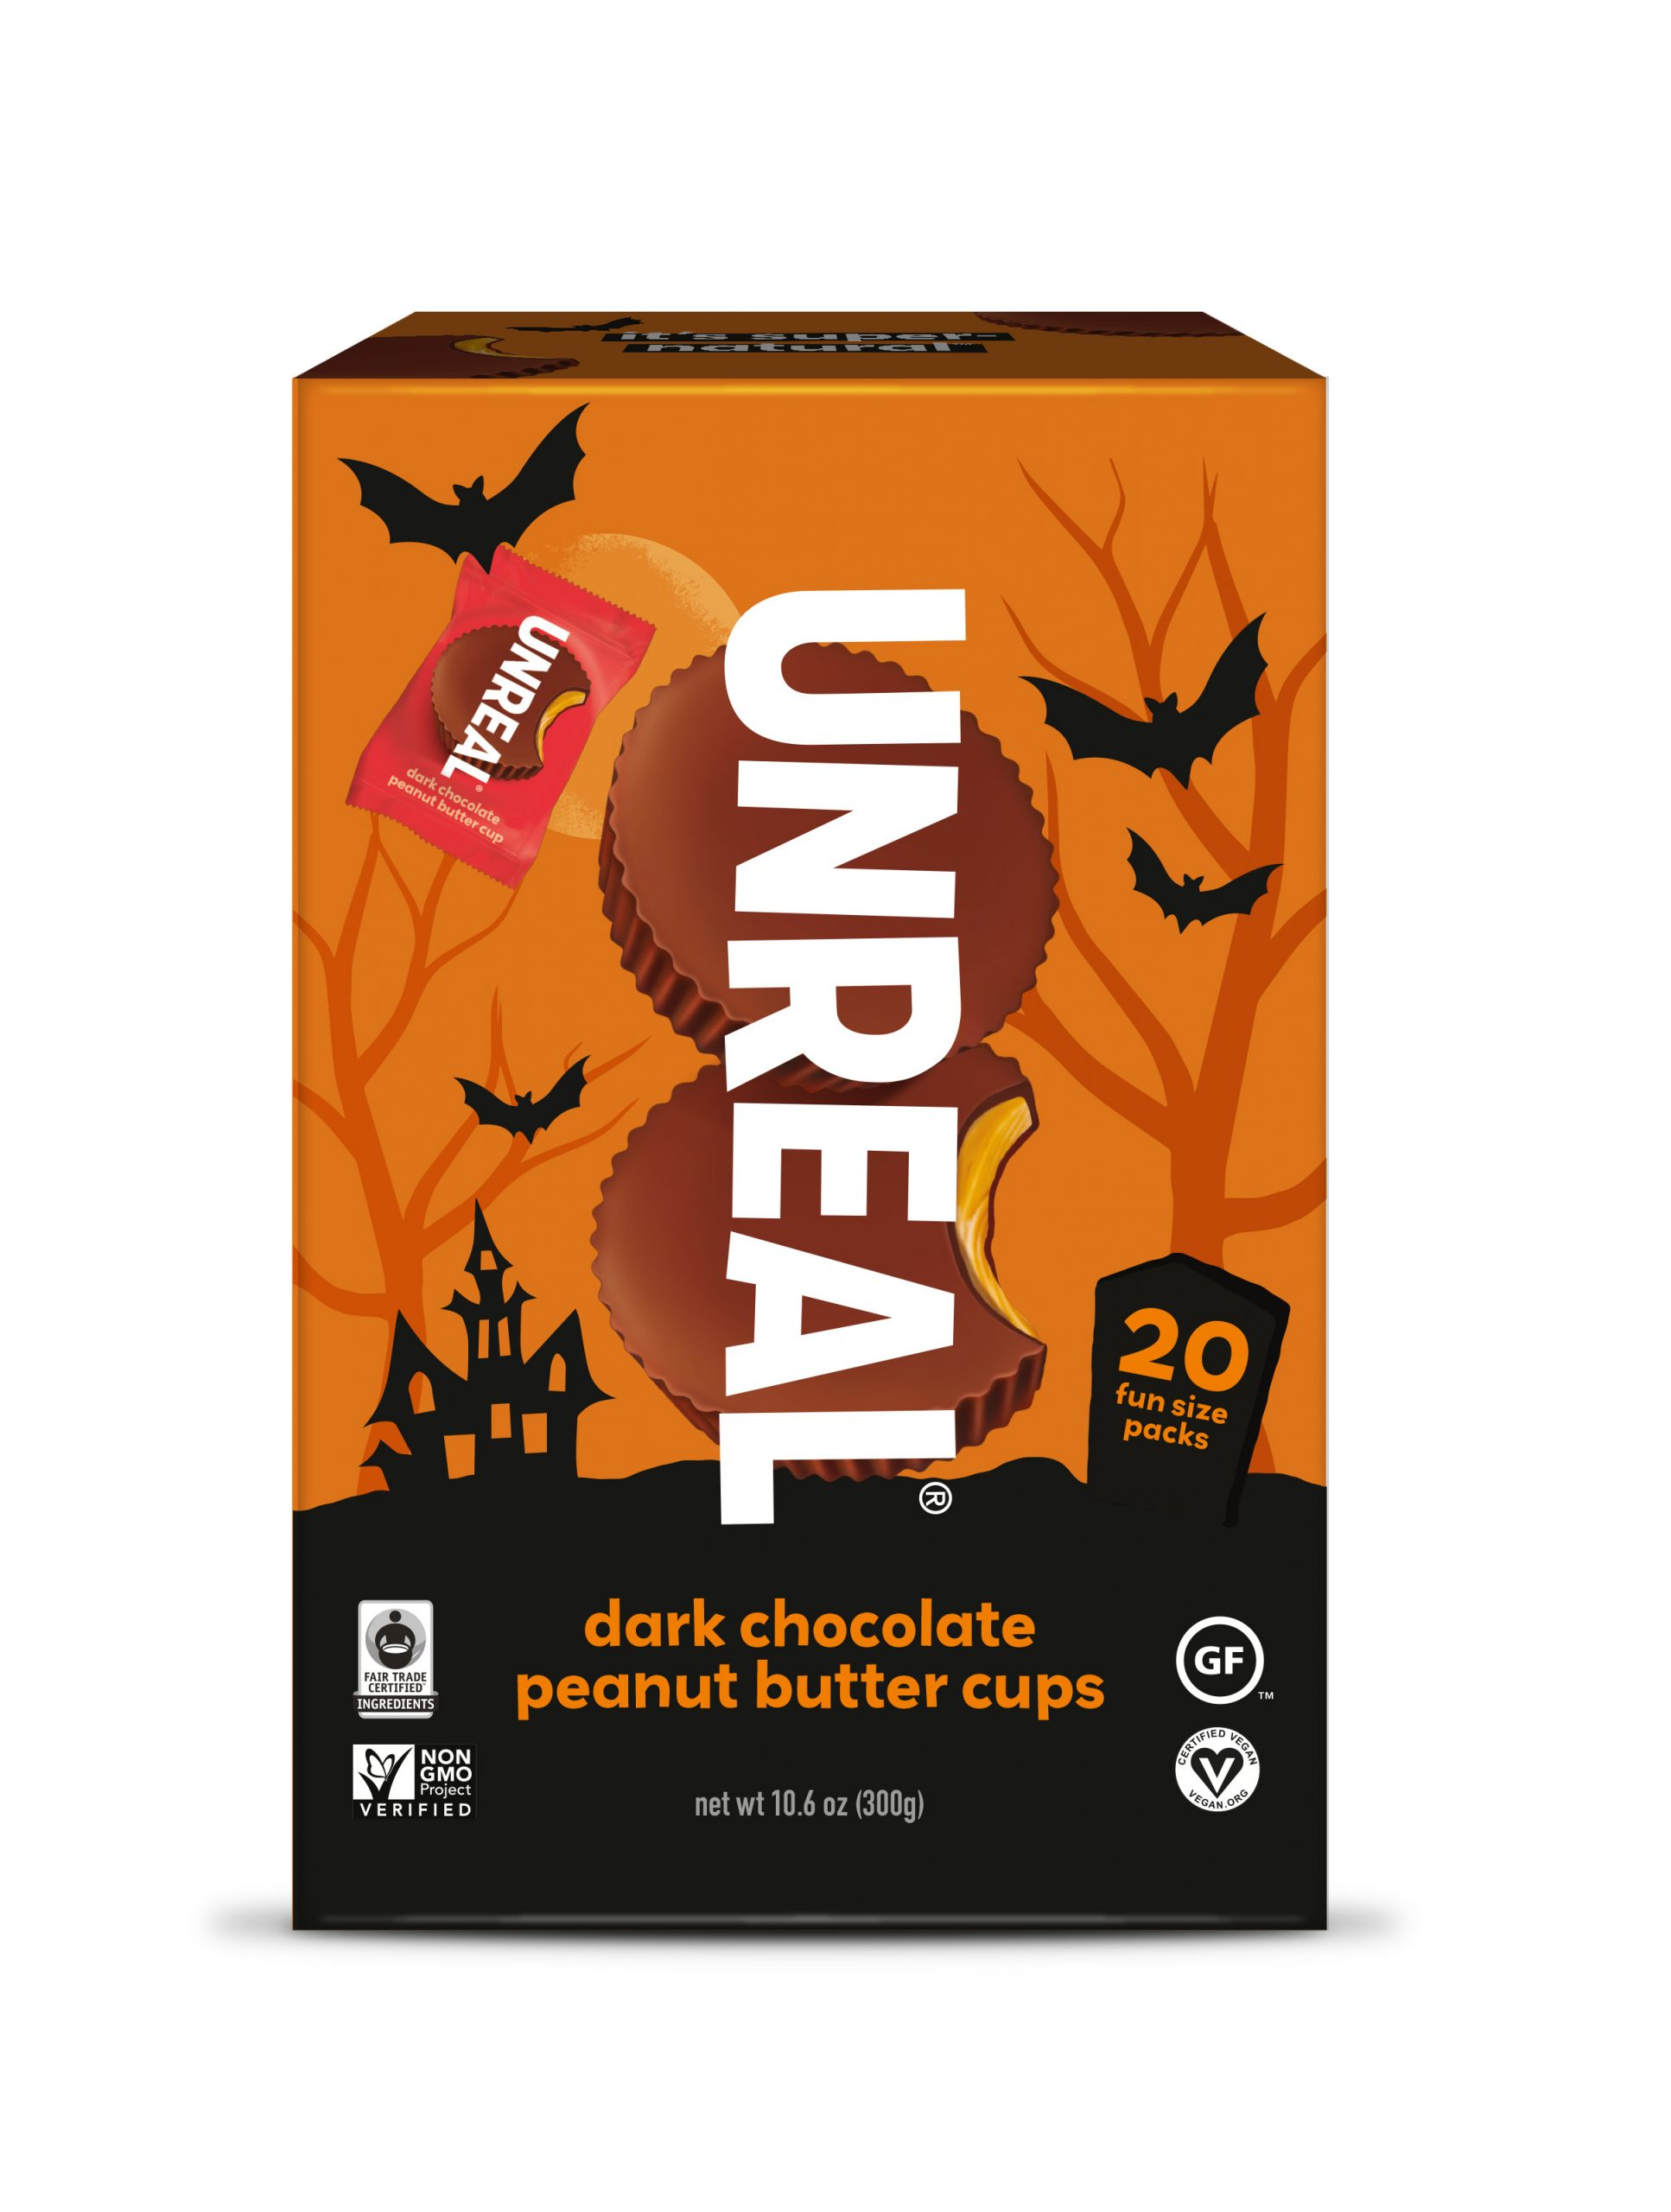 Unreal Chocolate